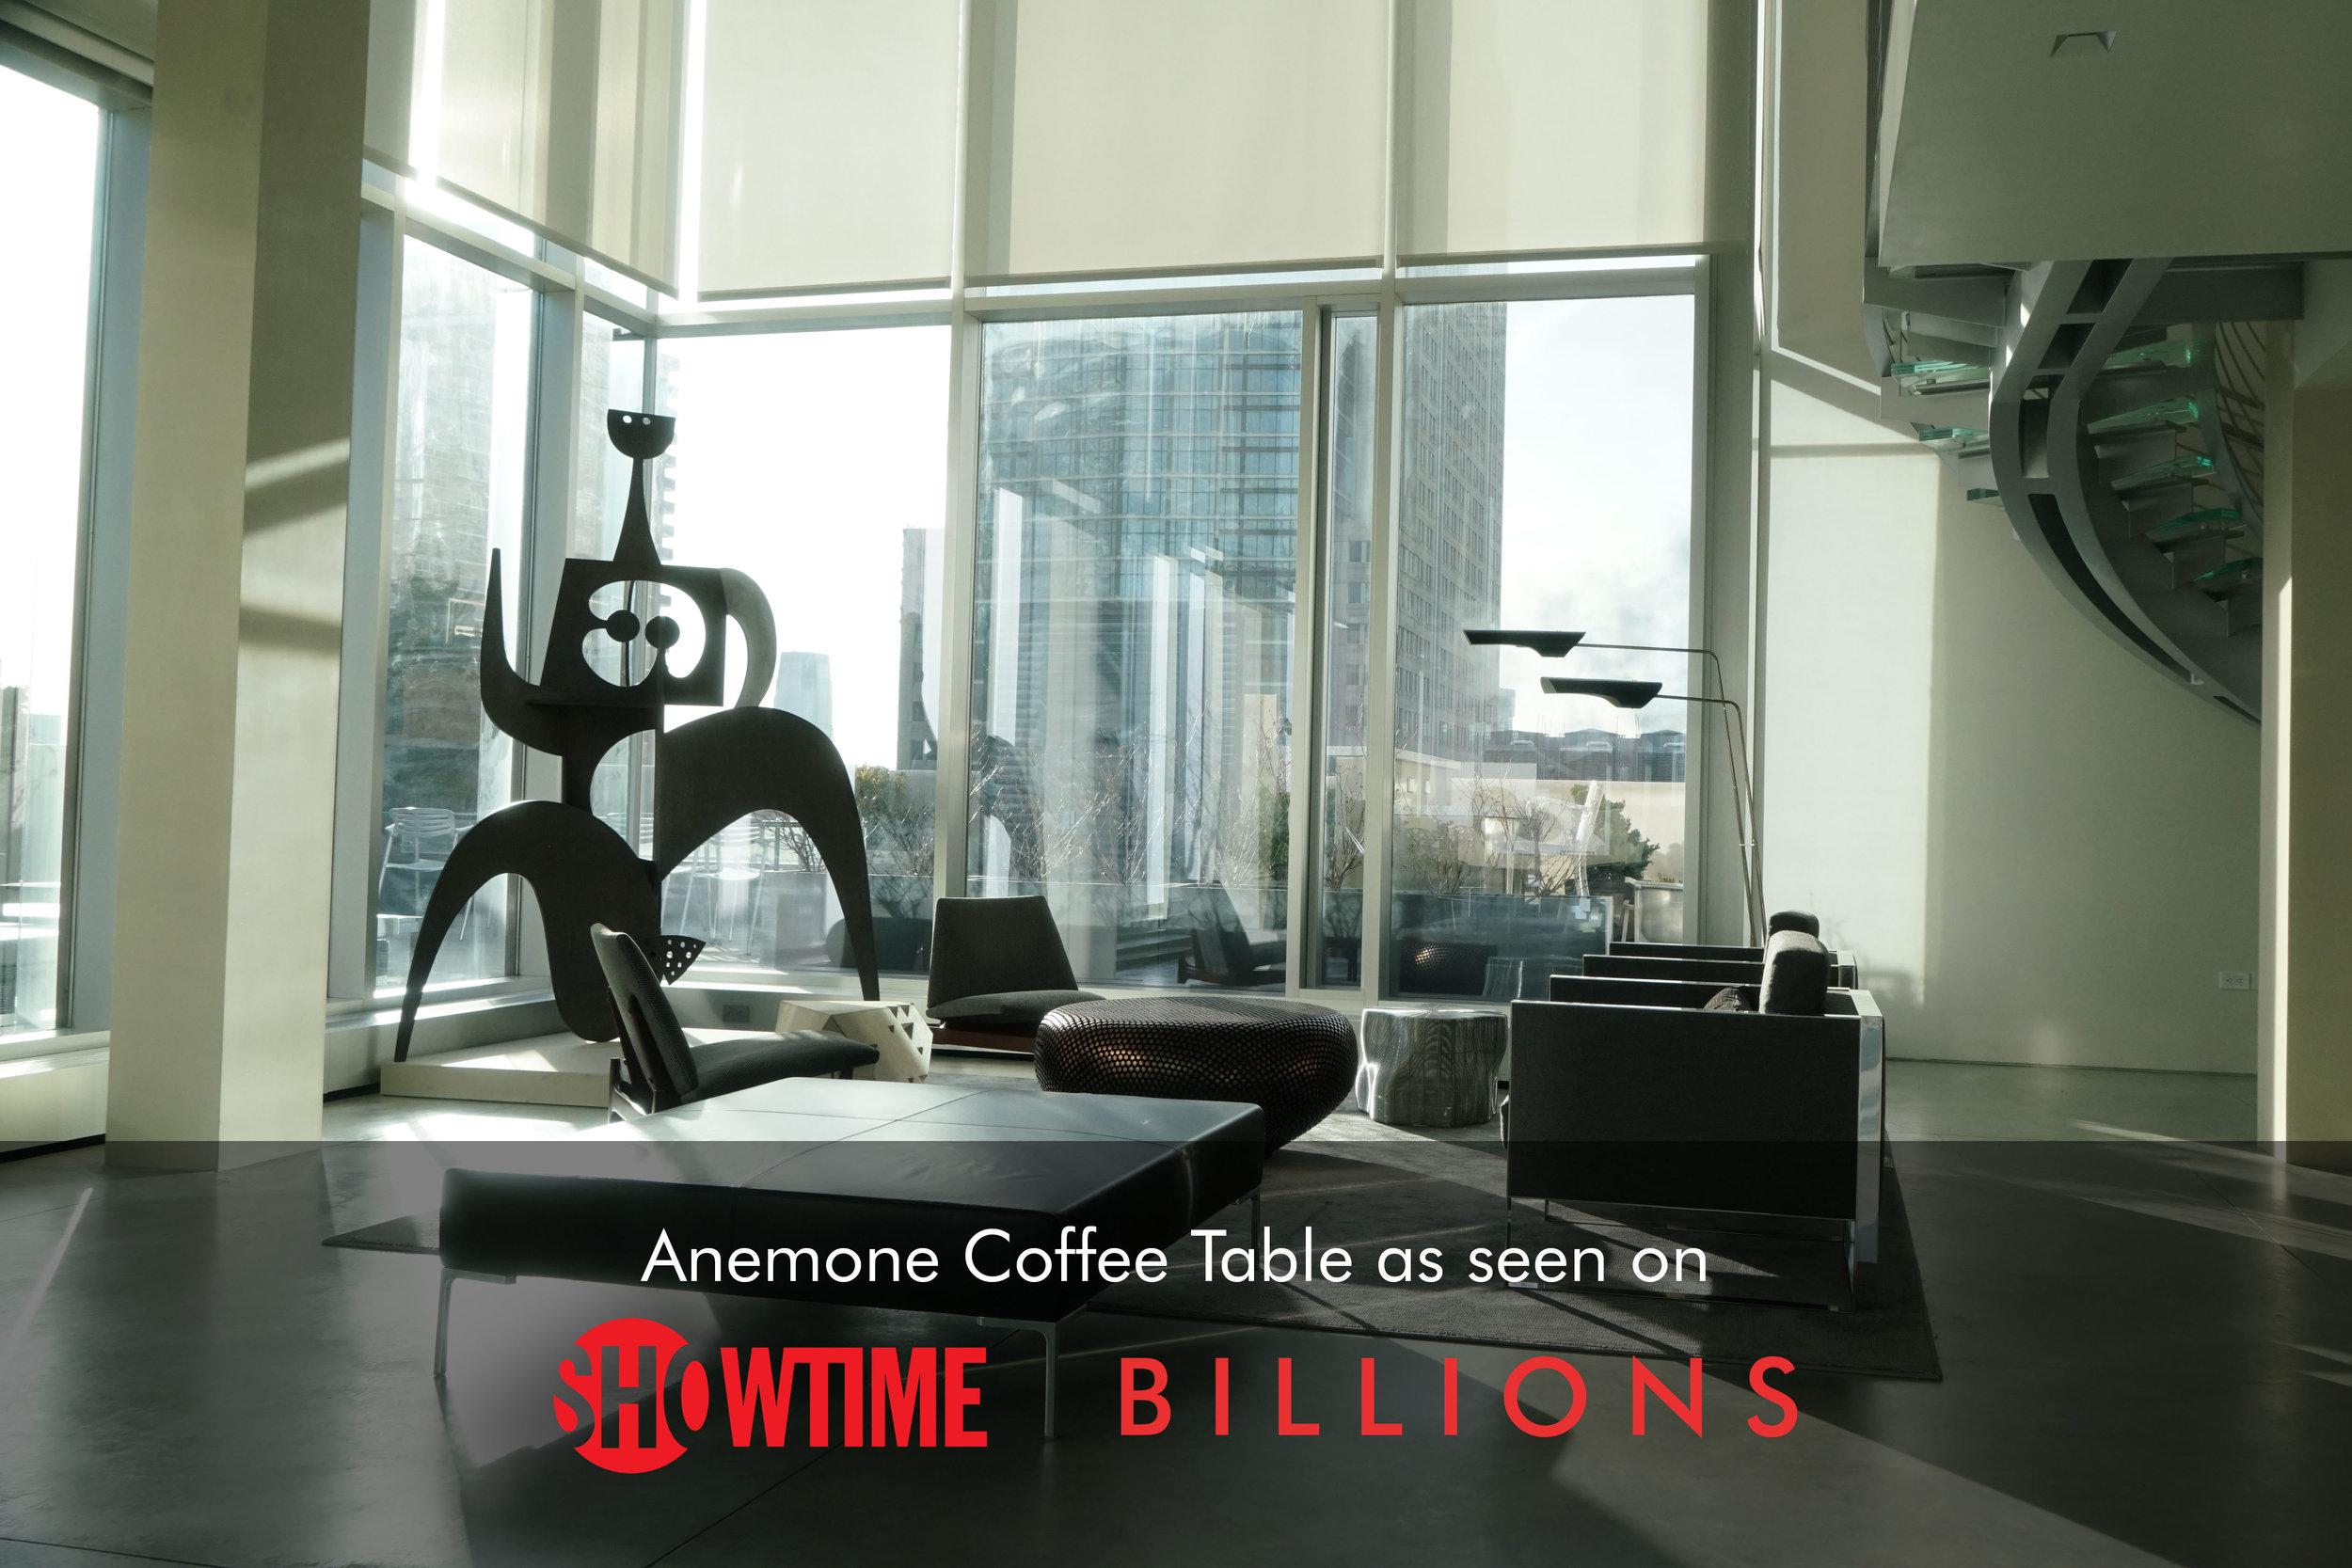 Billions A Label 1red.jpg